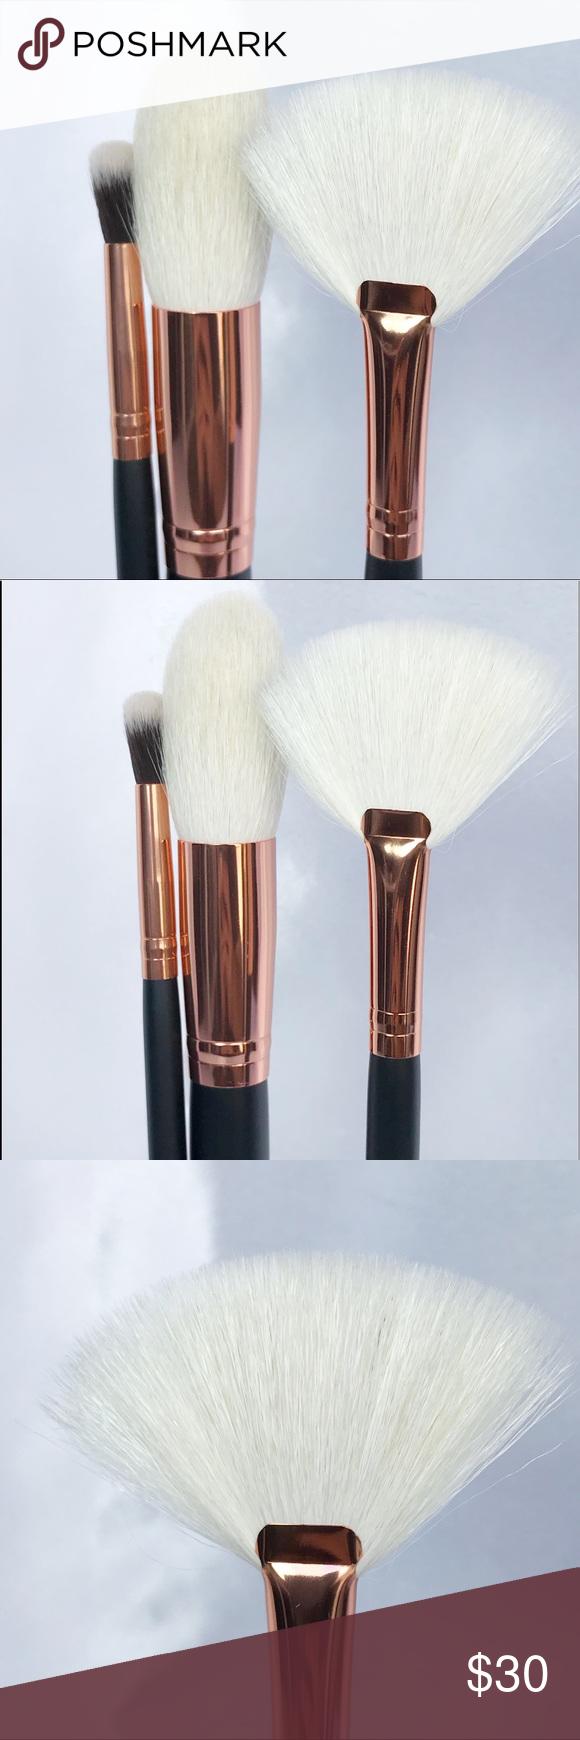 Morphe Brush Bundle🆕 NWT Sephora makeup brushes, Makeup